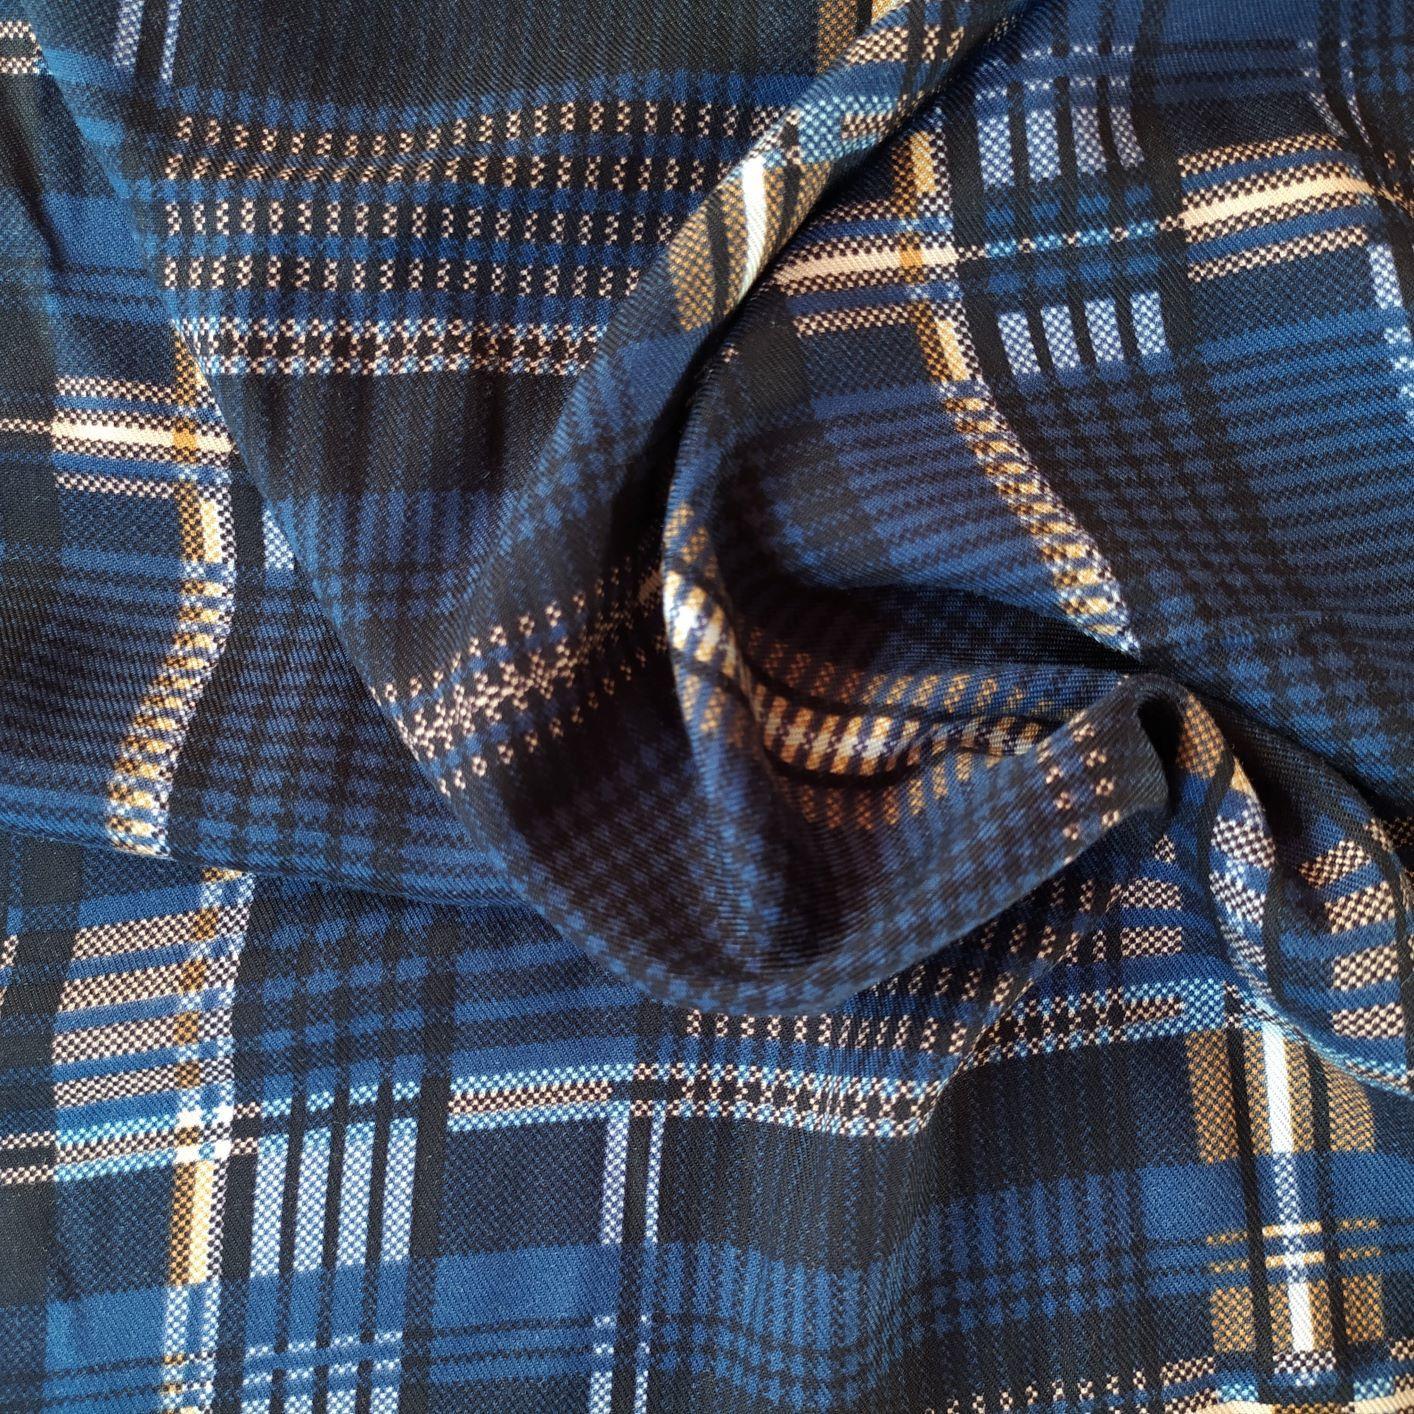 Tecido Viscose Sarjada Estampado Xadrez Azul